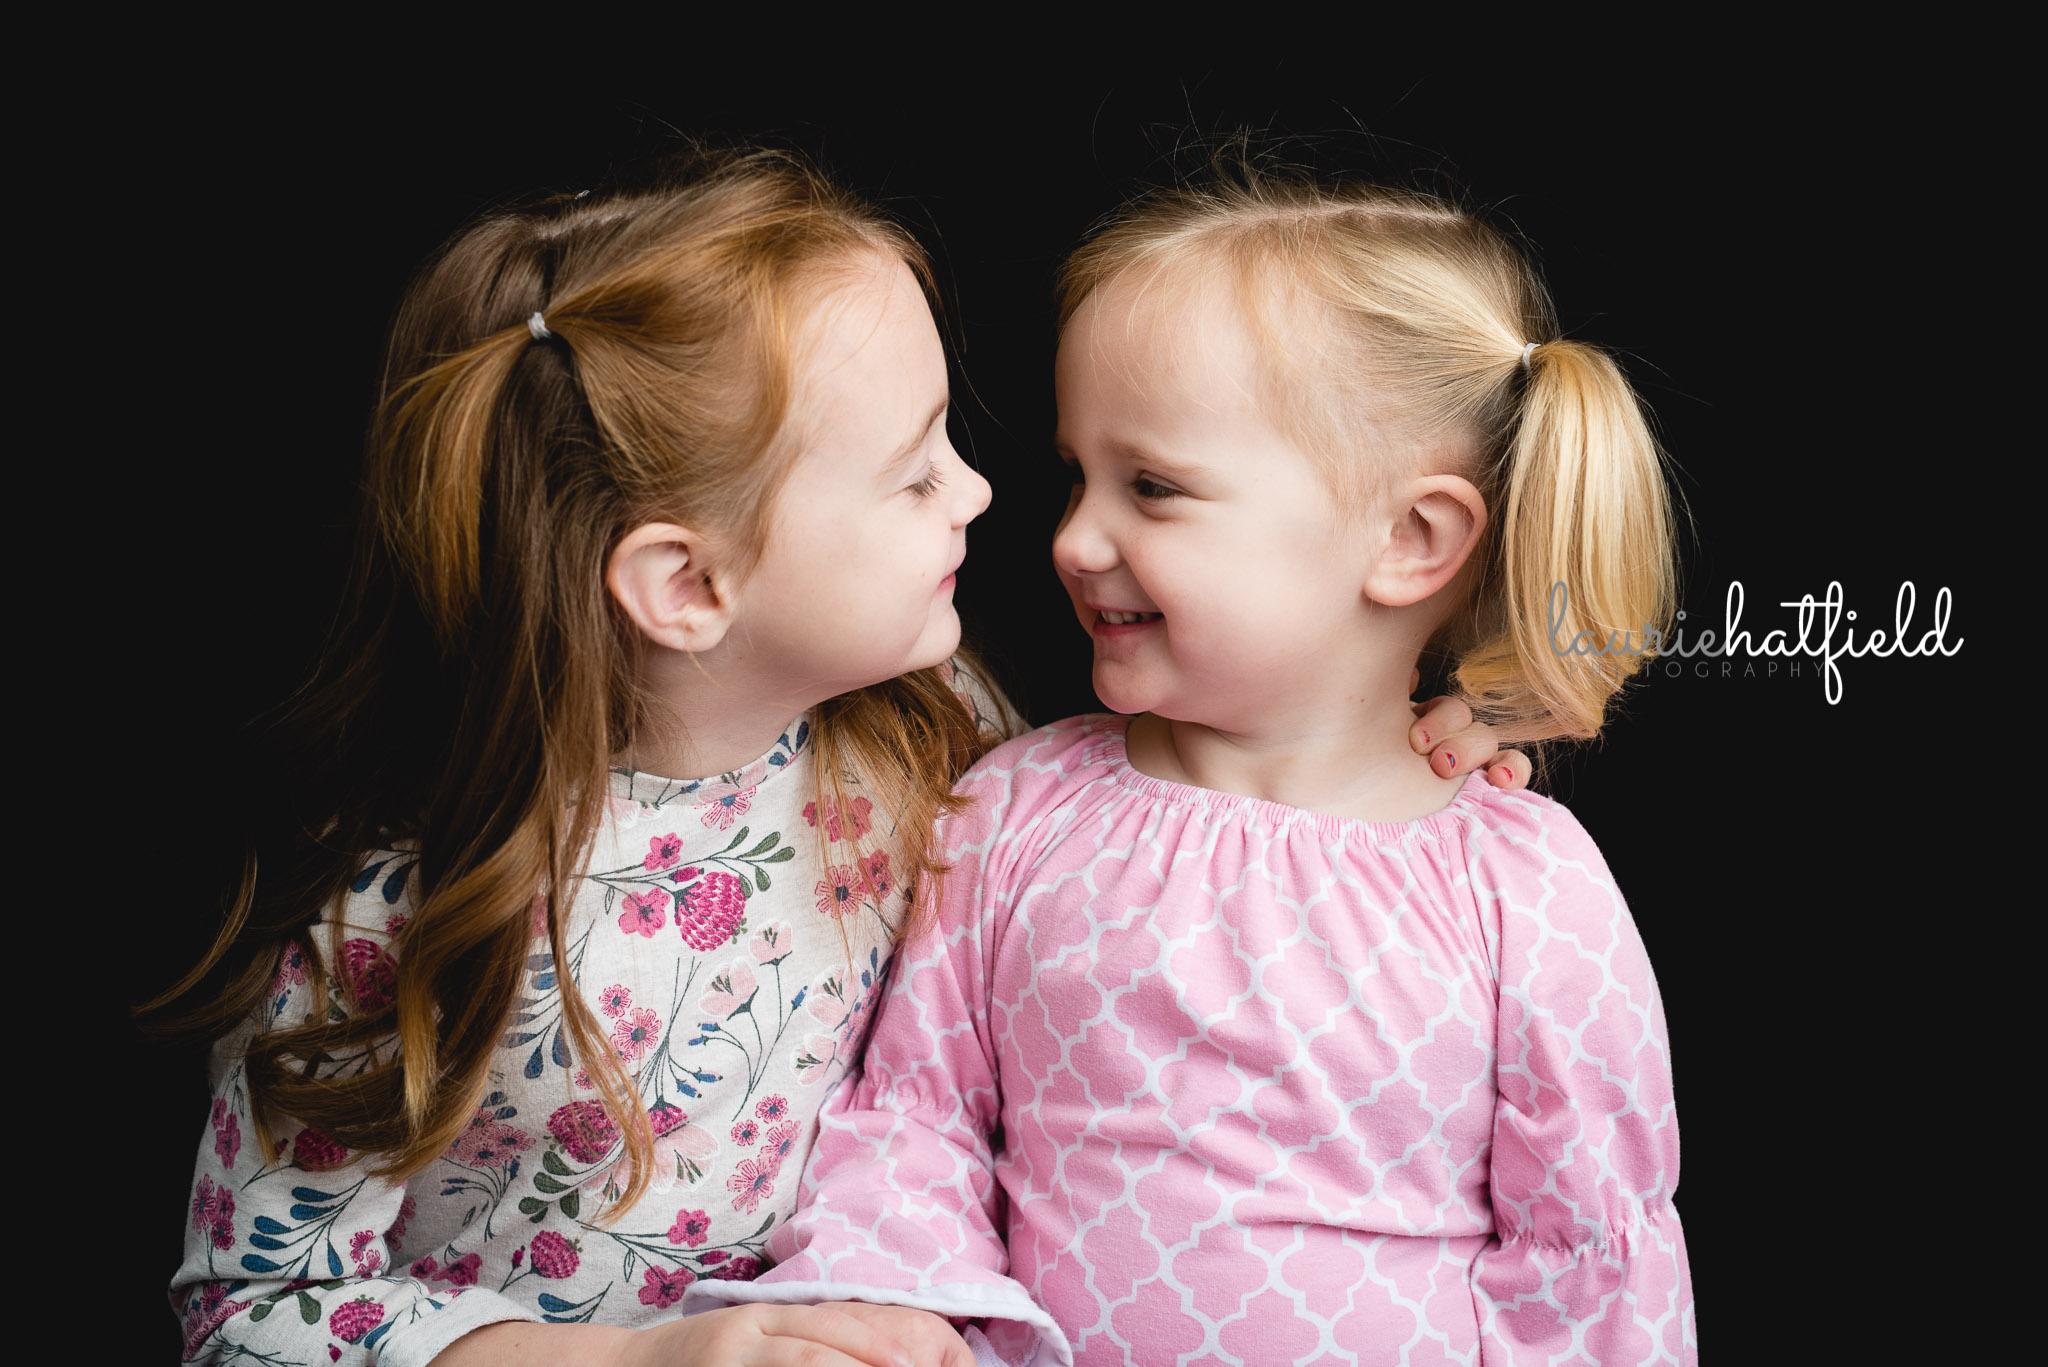 sisters looking at each other | Huntsville AL preschool portraits